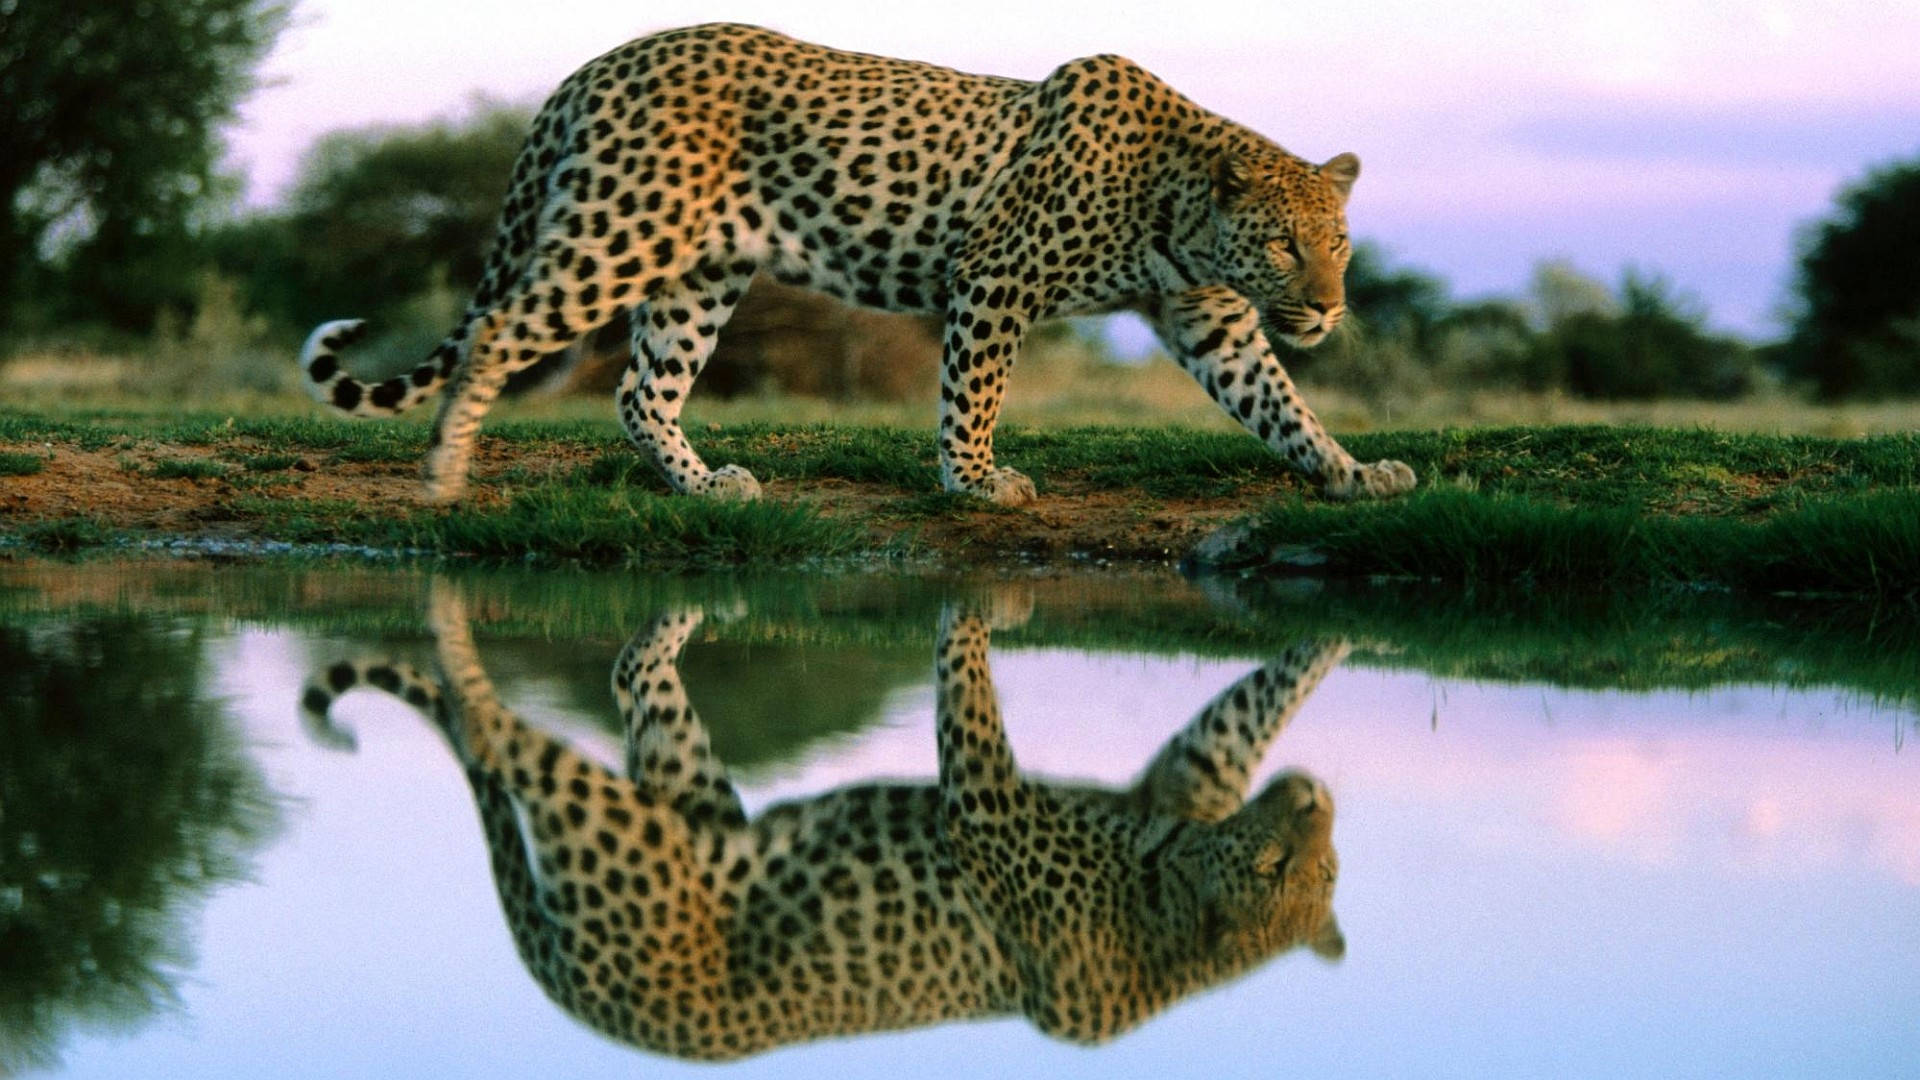 Res: 1920x1080, Cheetah Wallpaper